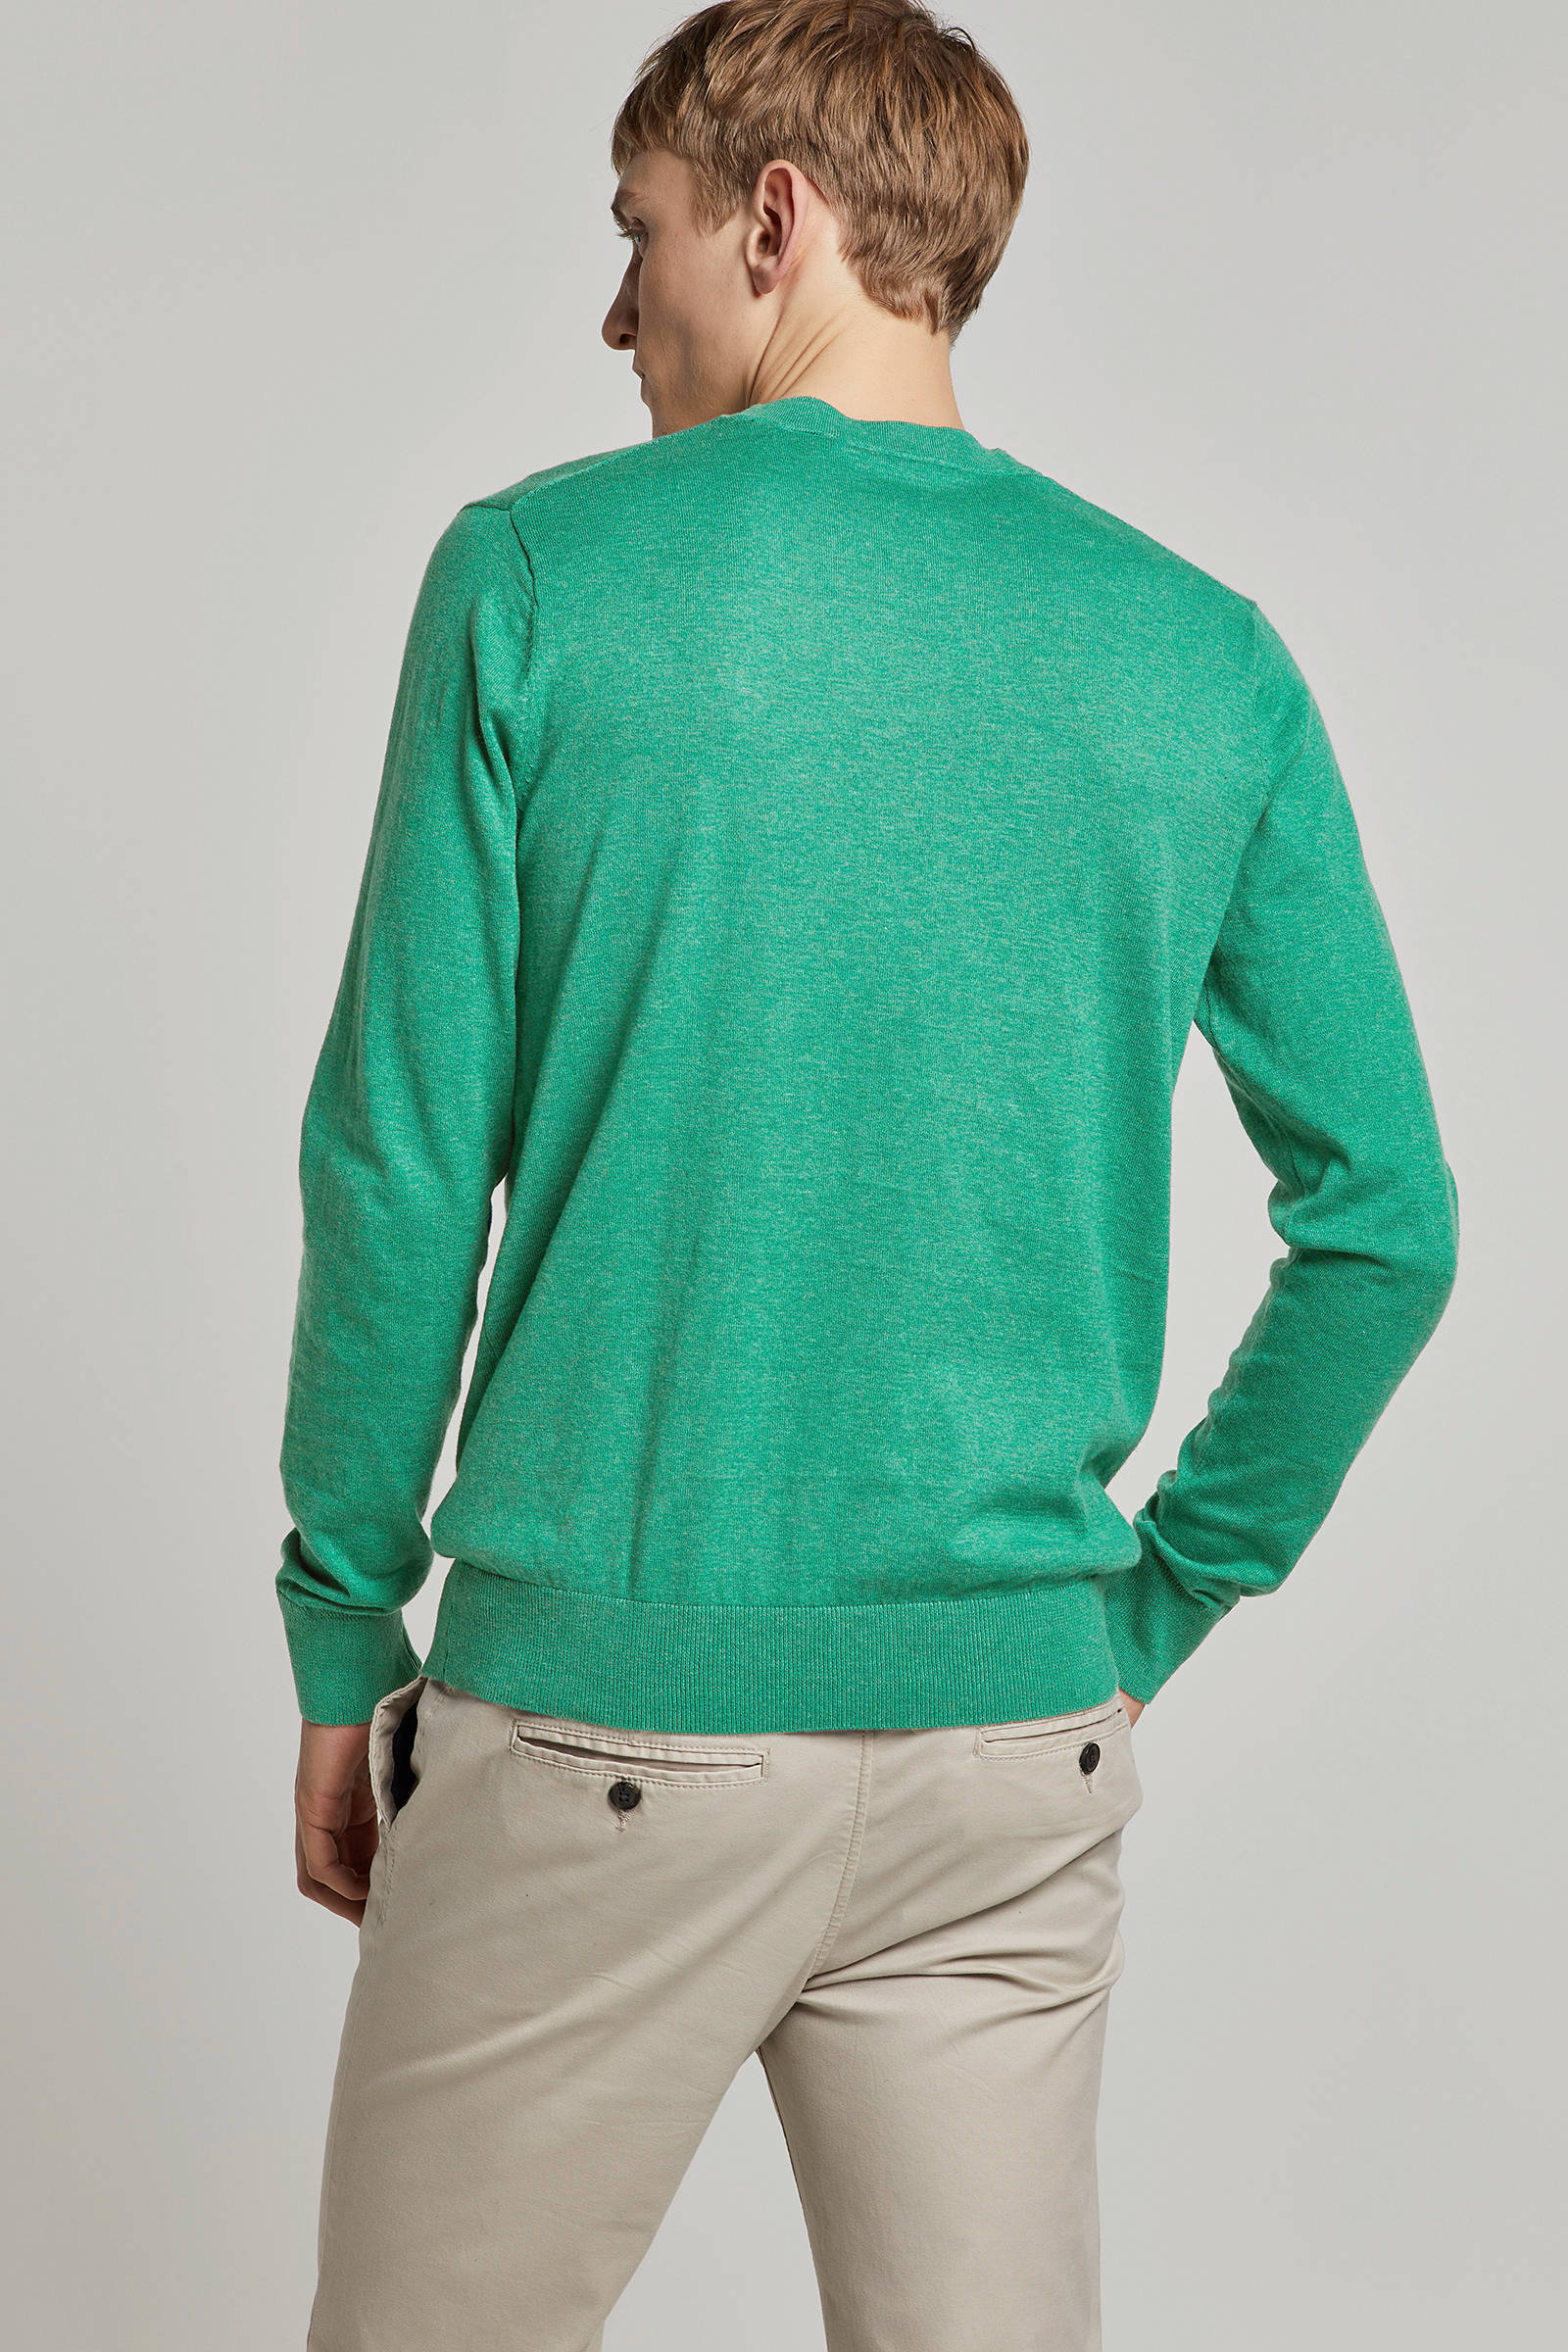 fc42742dde5 gemêleerde trui groen